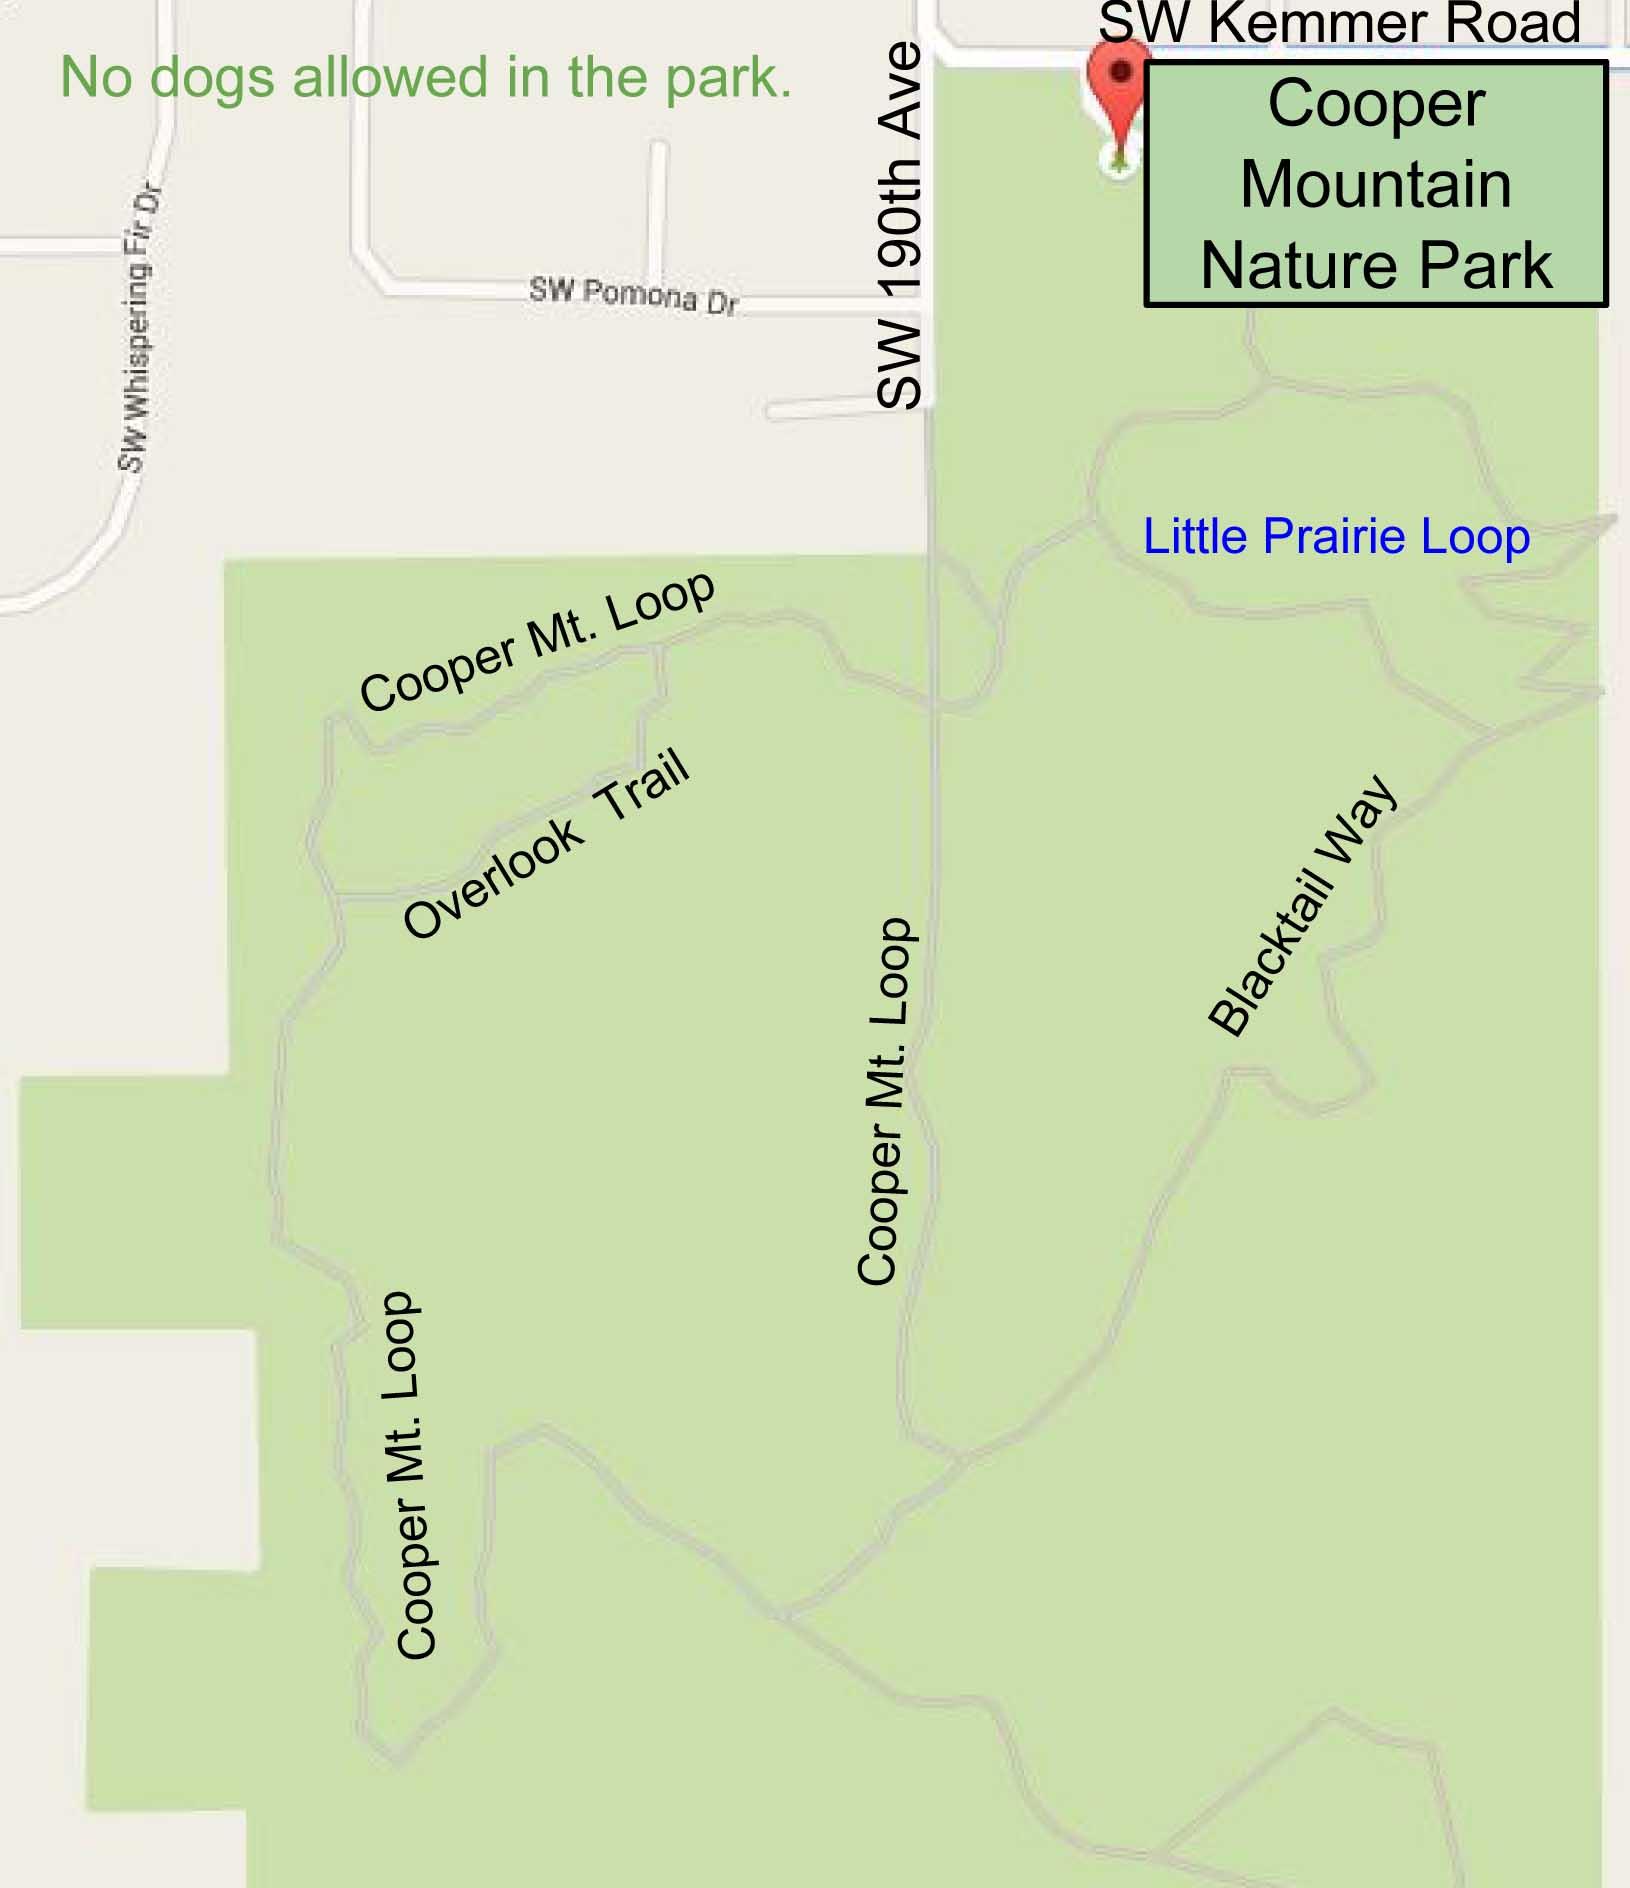 Cooper Mtn. map